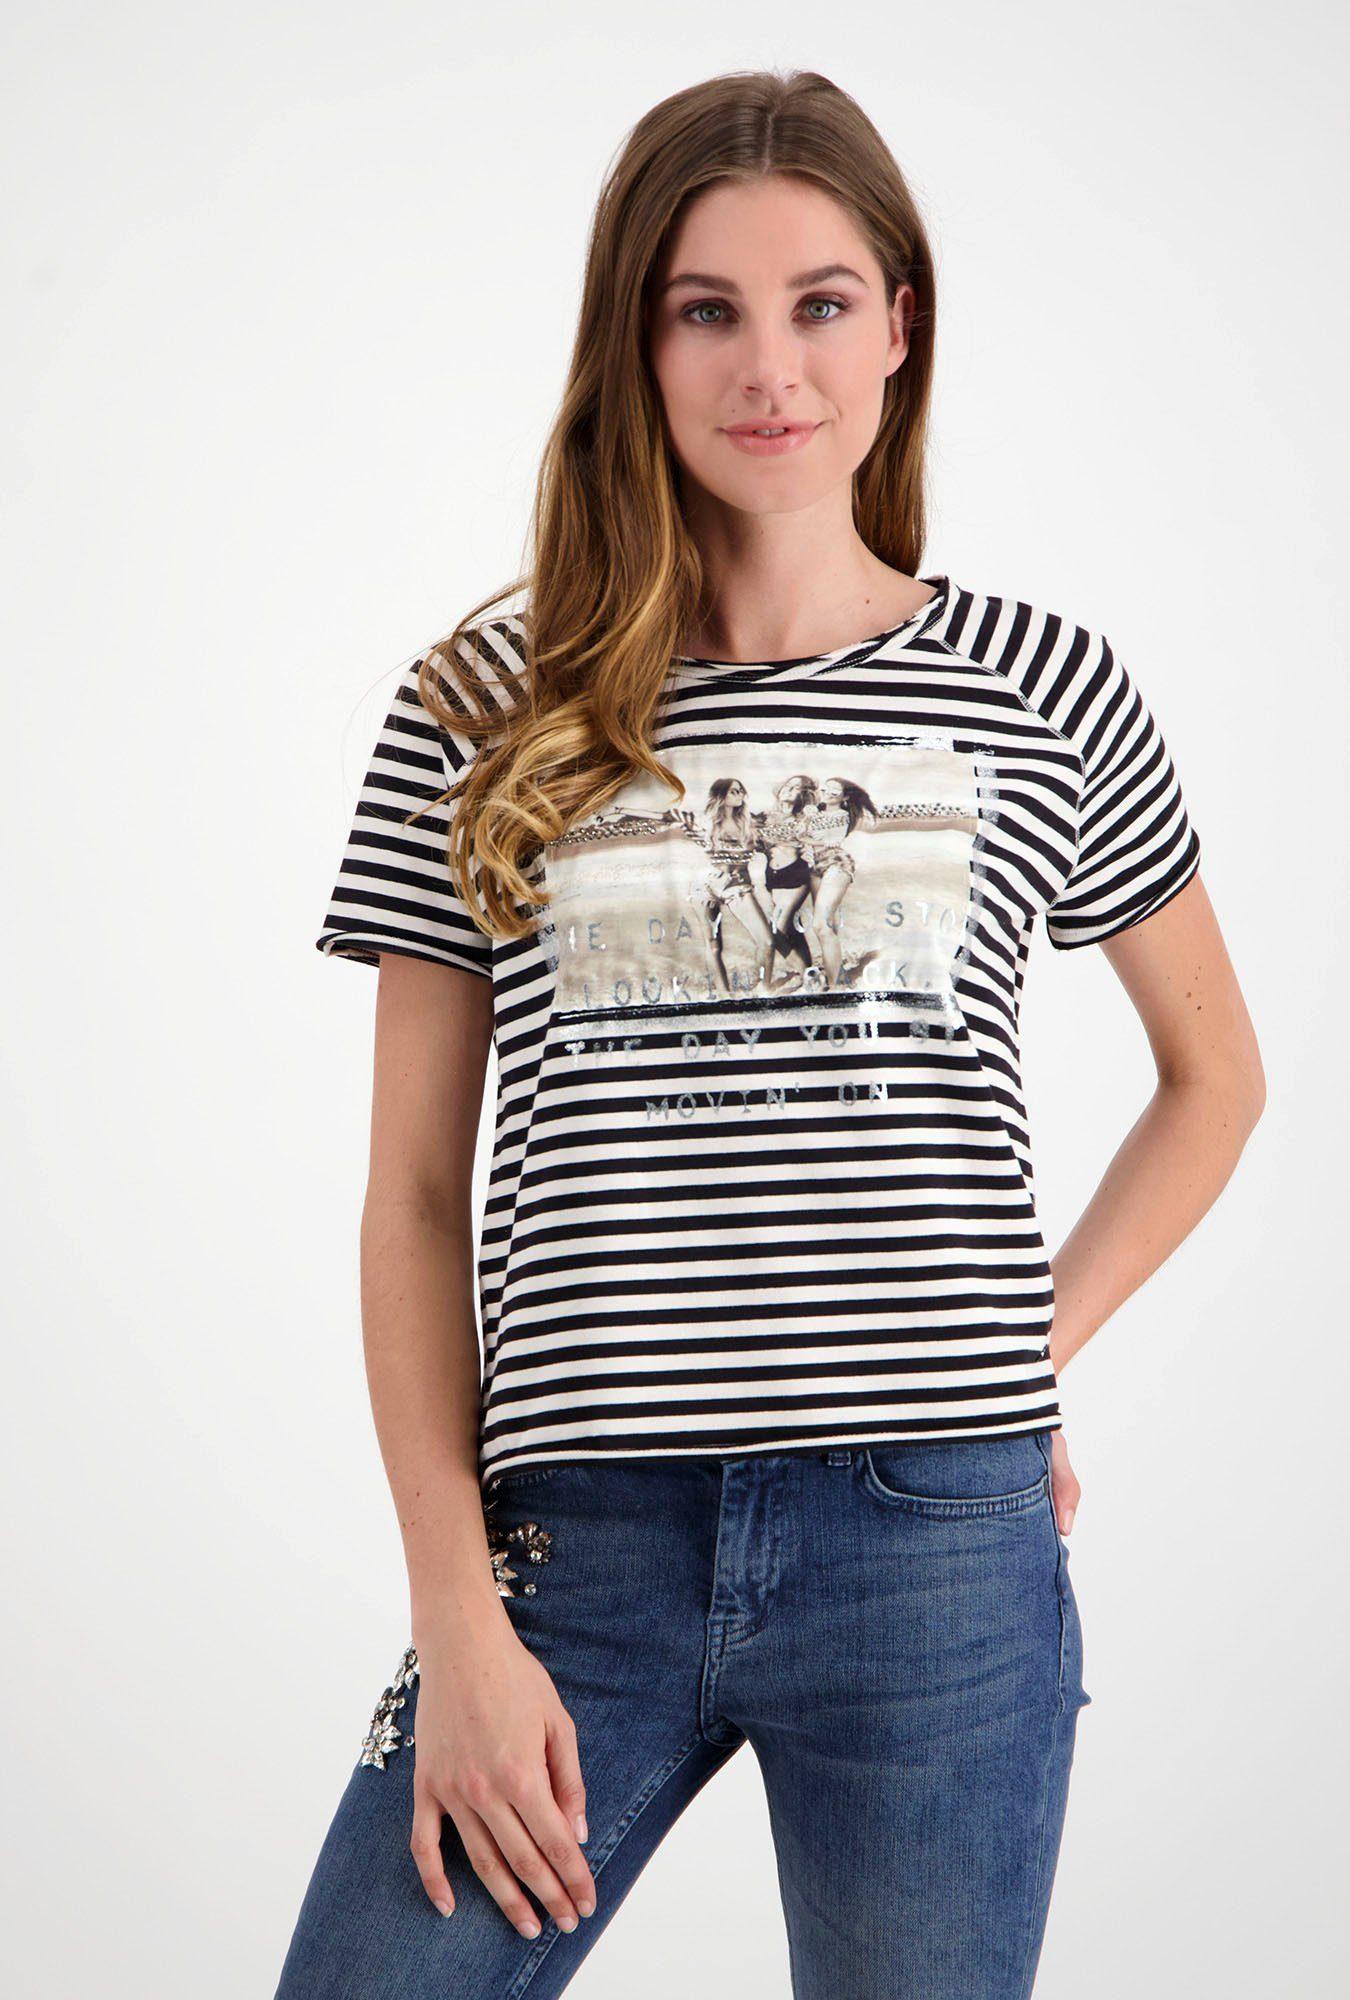 Monari Damen Shirt aus Sweatware offwhite mit Print